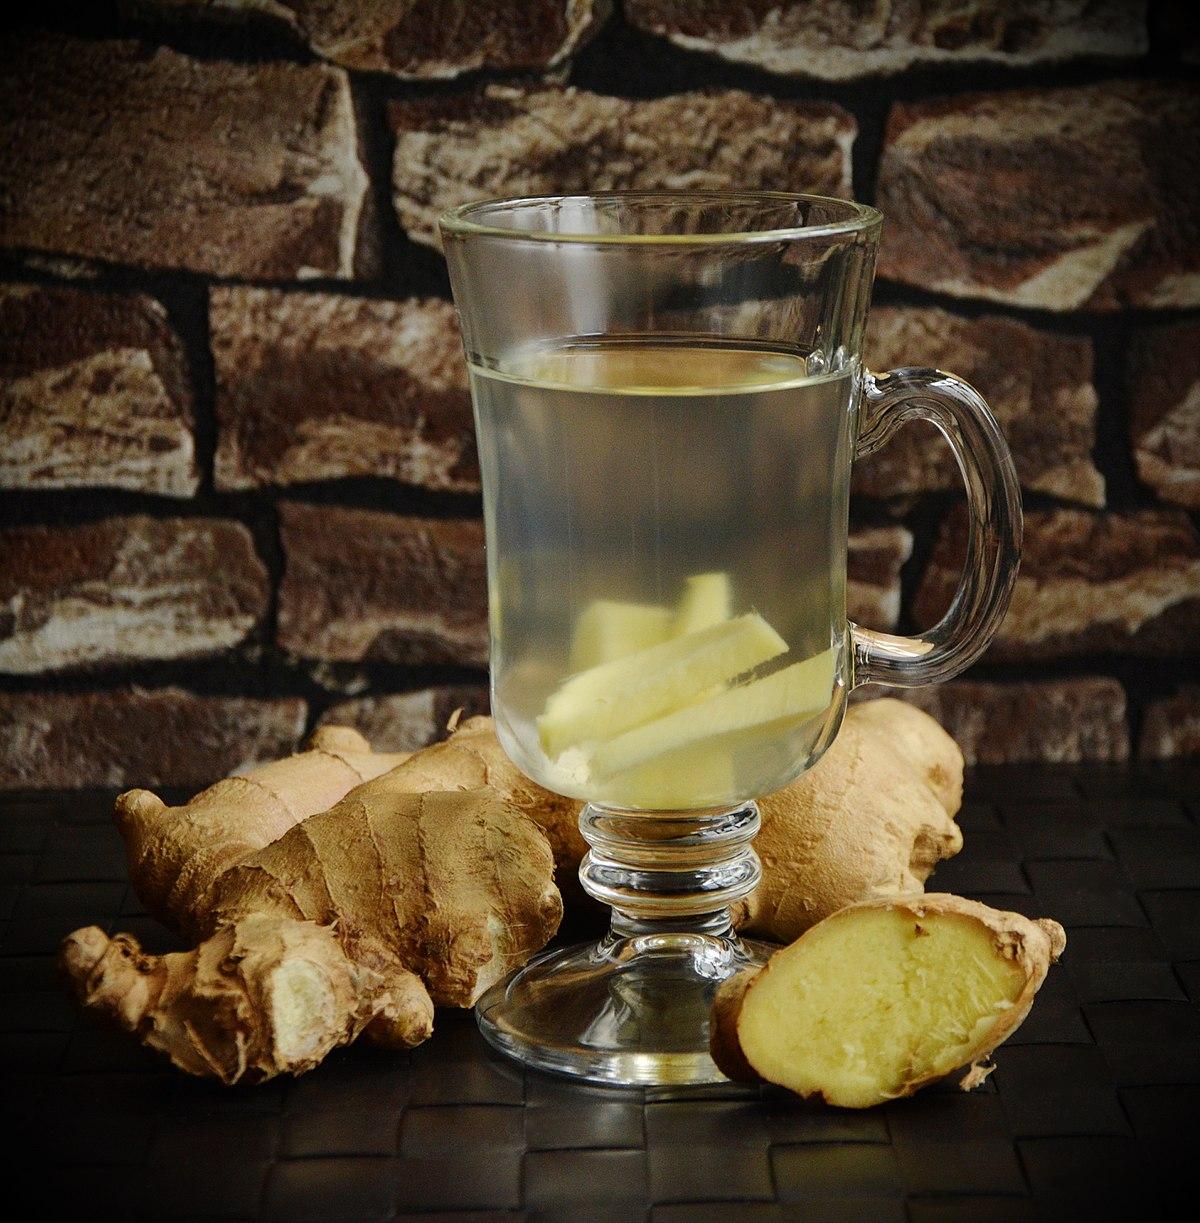 Ginger Tea Wikipedia Kerupuk Kemplang Ikan By Ff Pgp